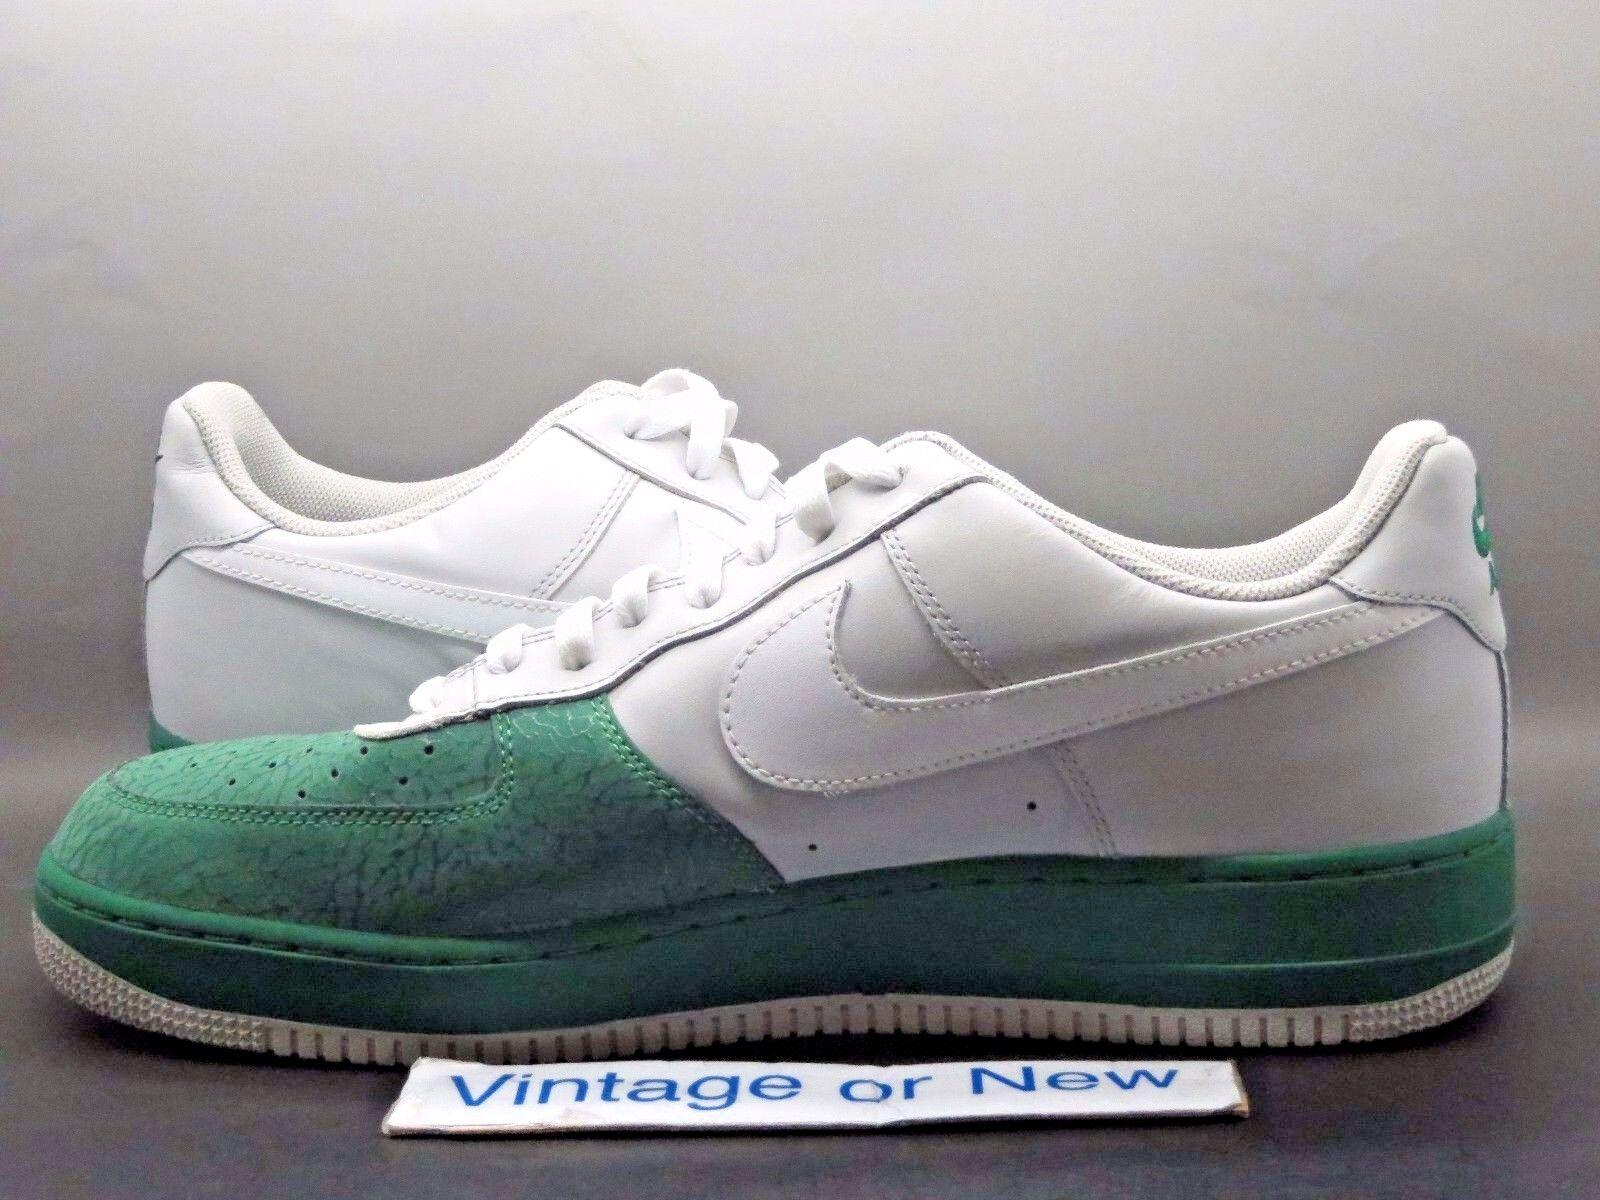 Nike grün air force 1 niedrig '07 neutralen grau pine grün Nike - weiße 2009 sz. 2beccf